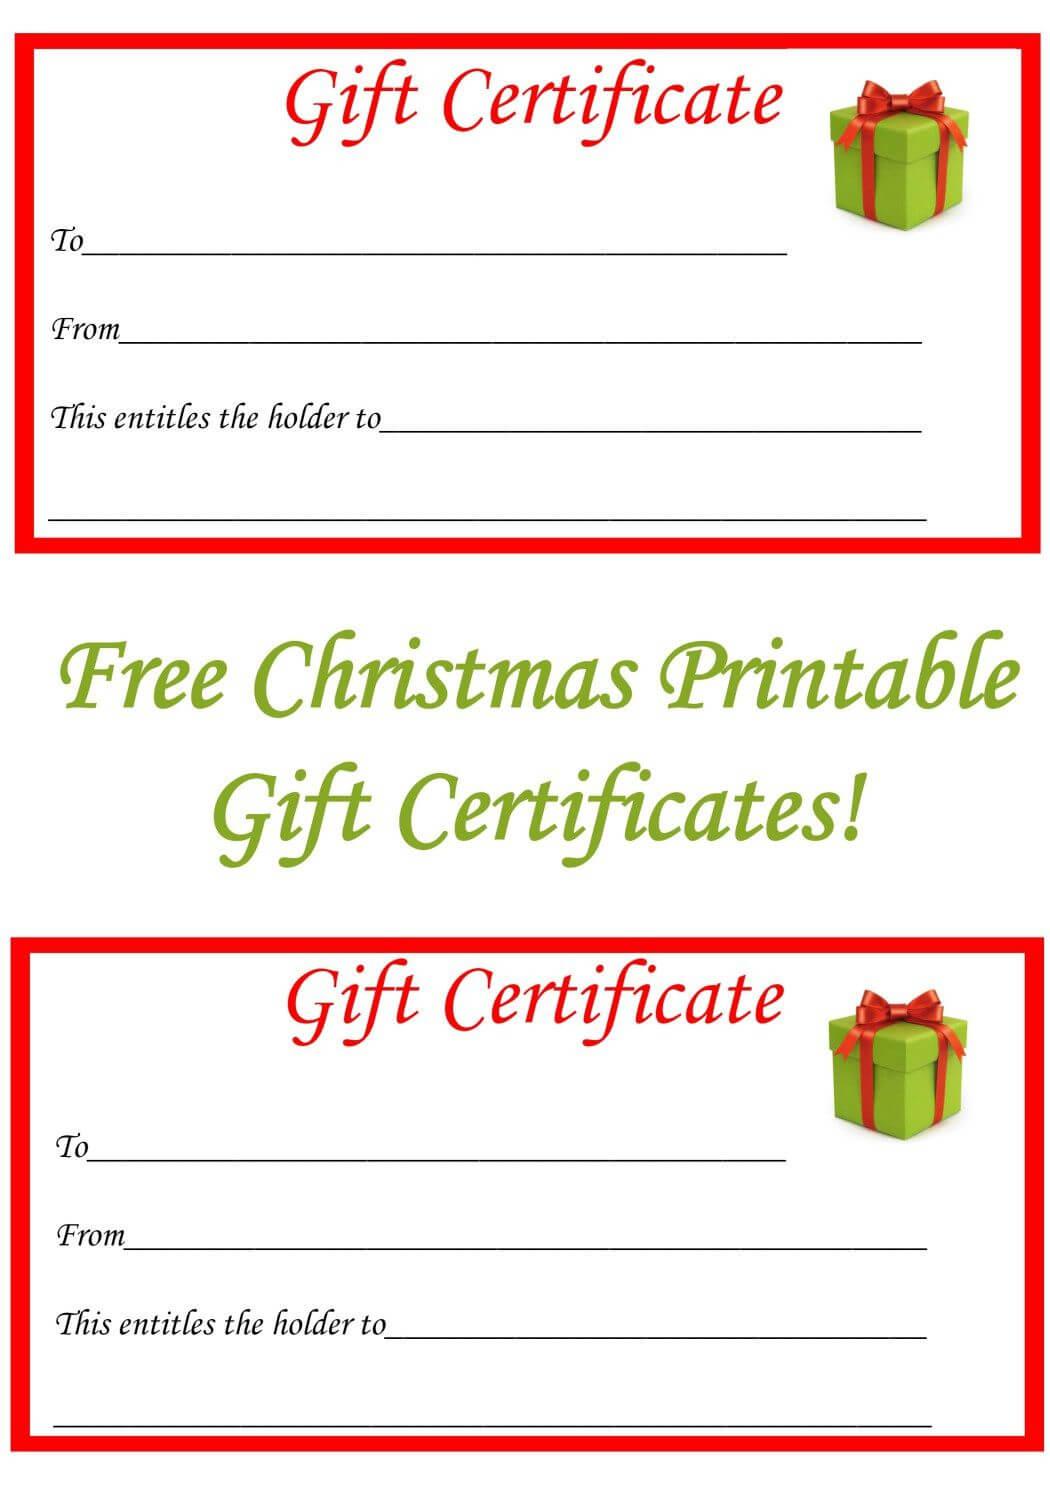 Free Christmas Printable Gift Certificates | Gifts | Free Inside Homemade Christmas Gift Certificates Templates